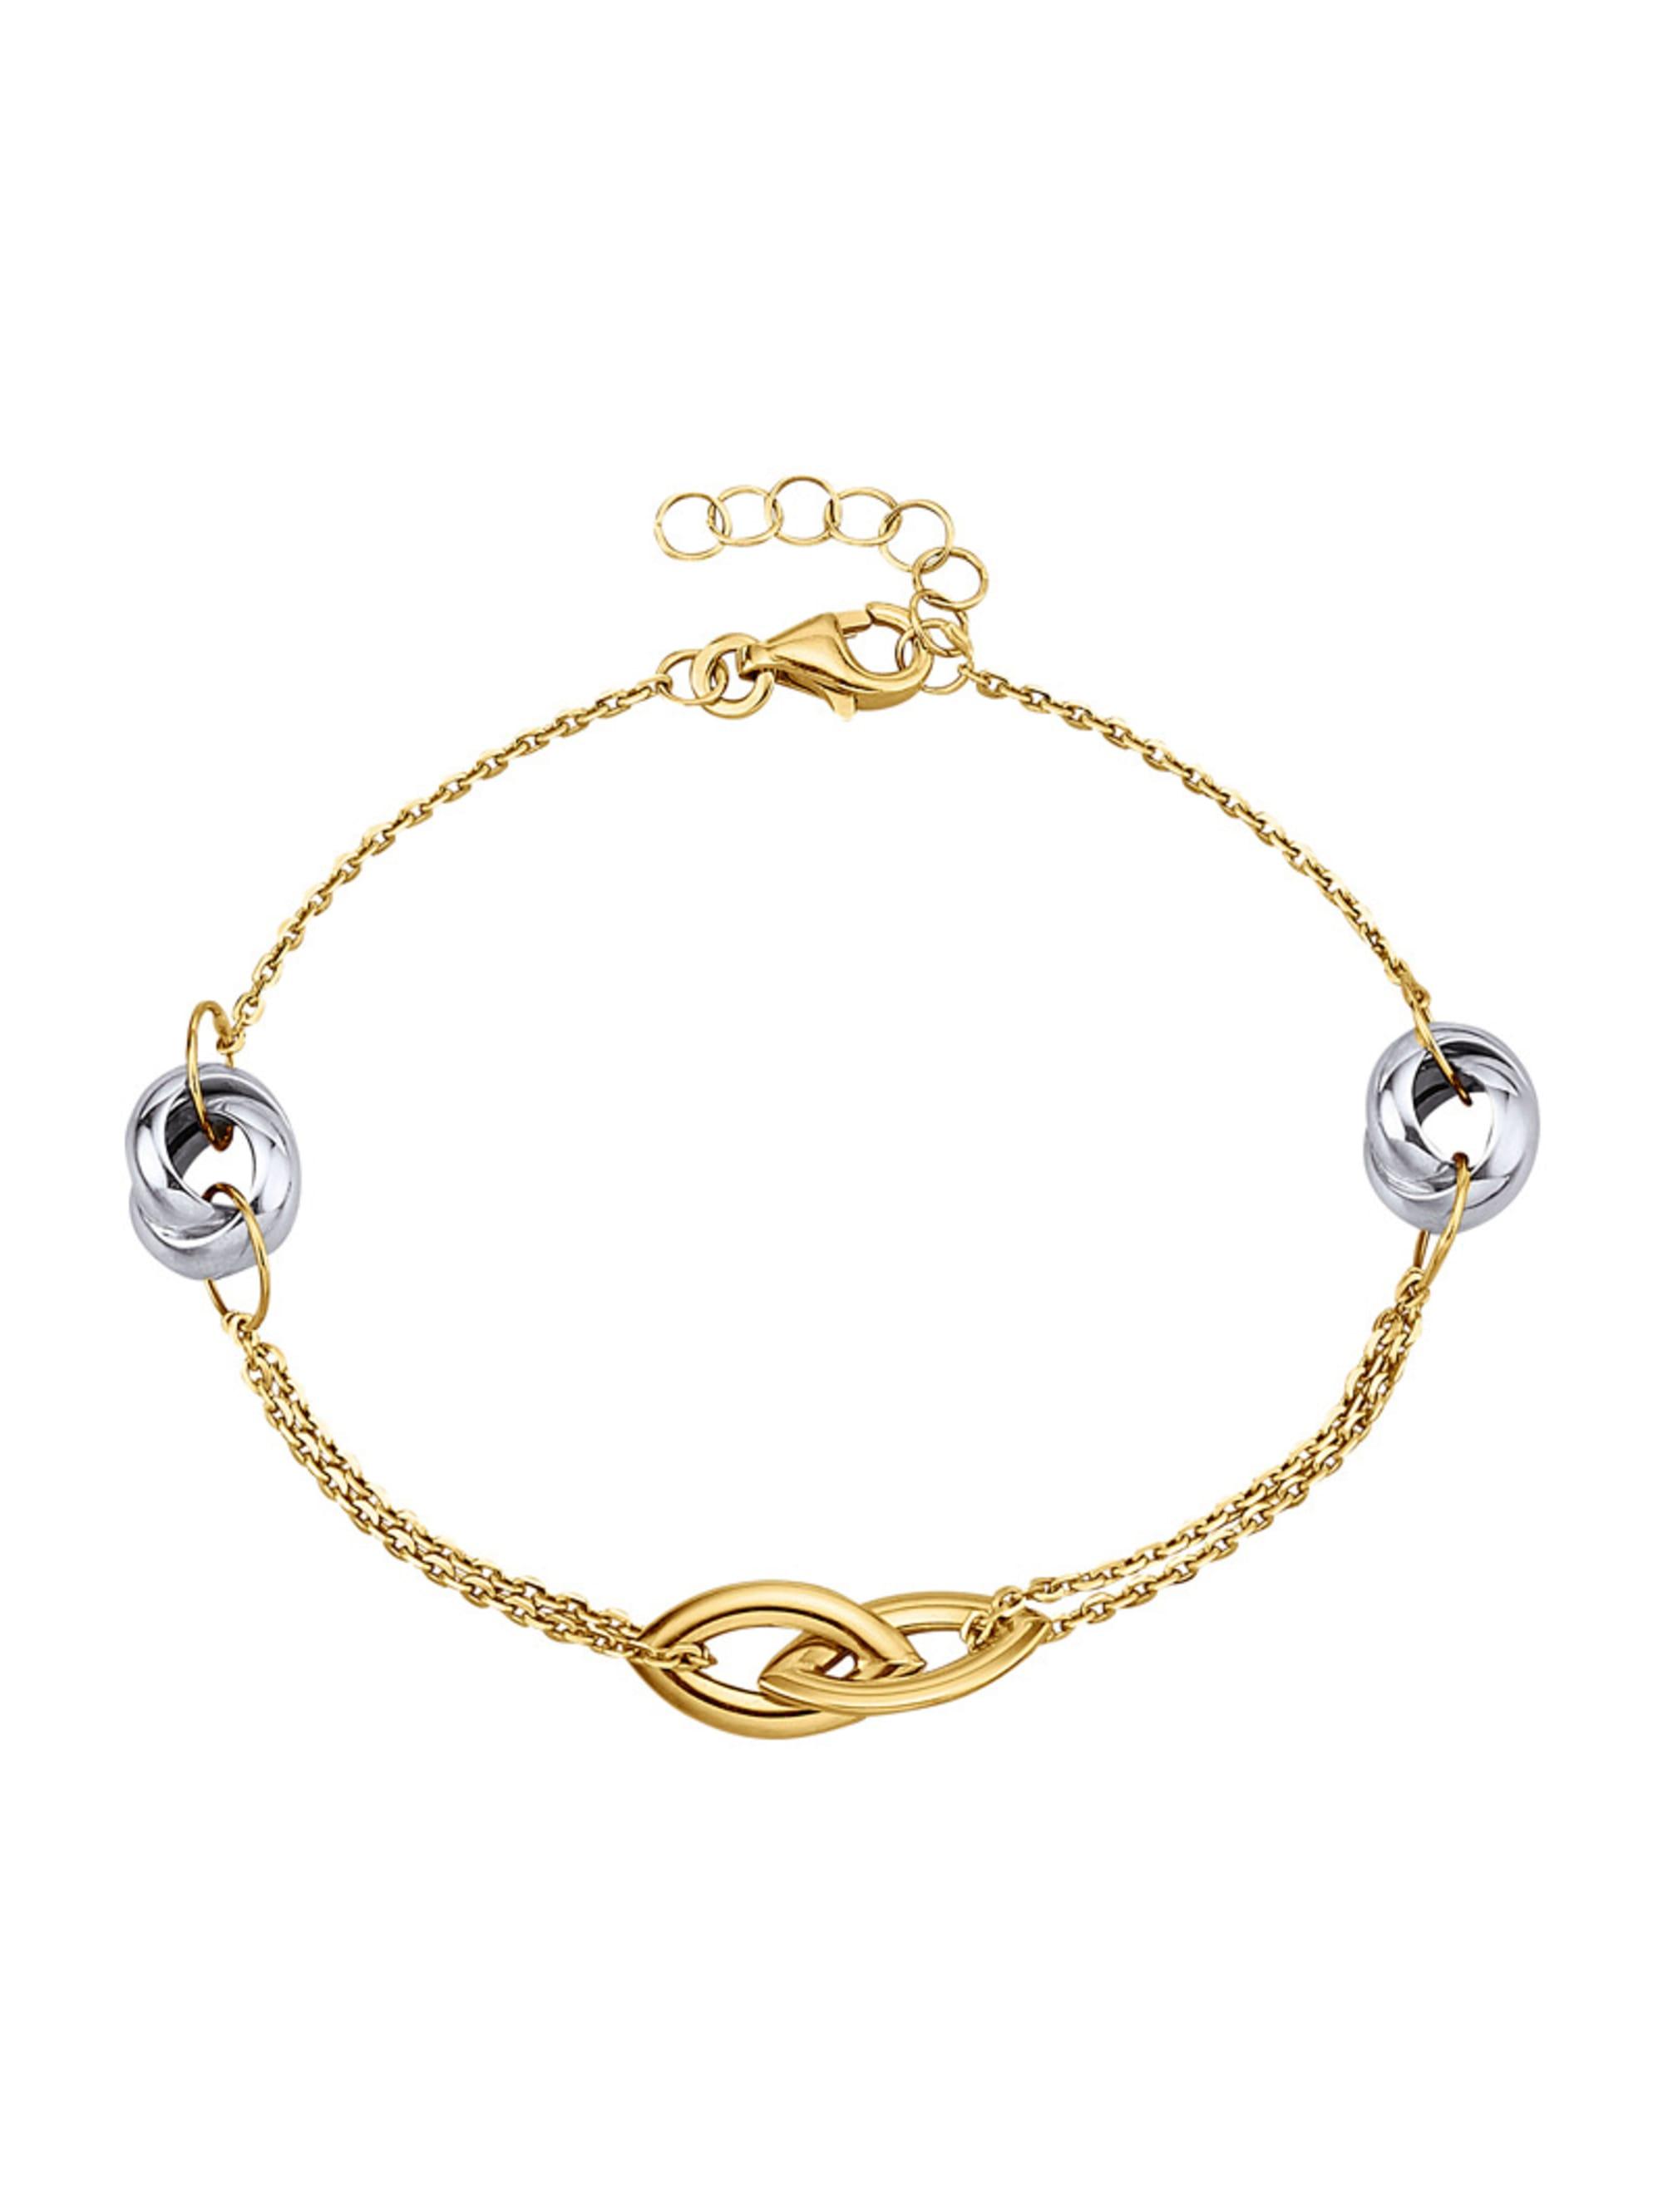 Armband in Gelbgold 375 KuZ4s